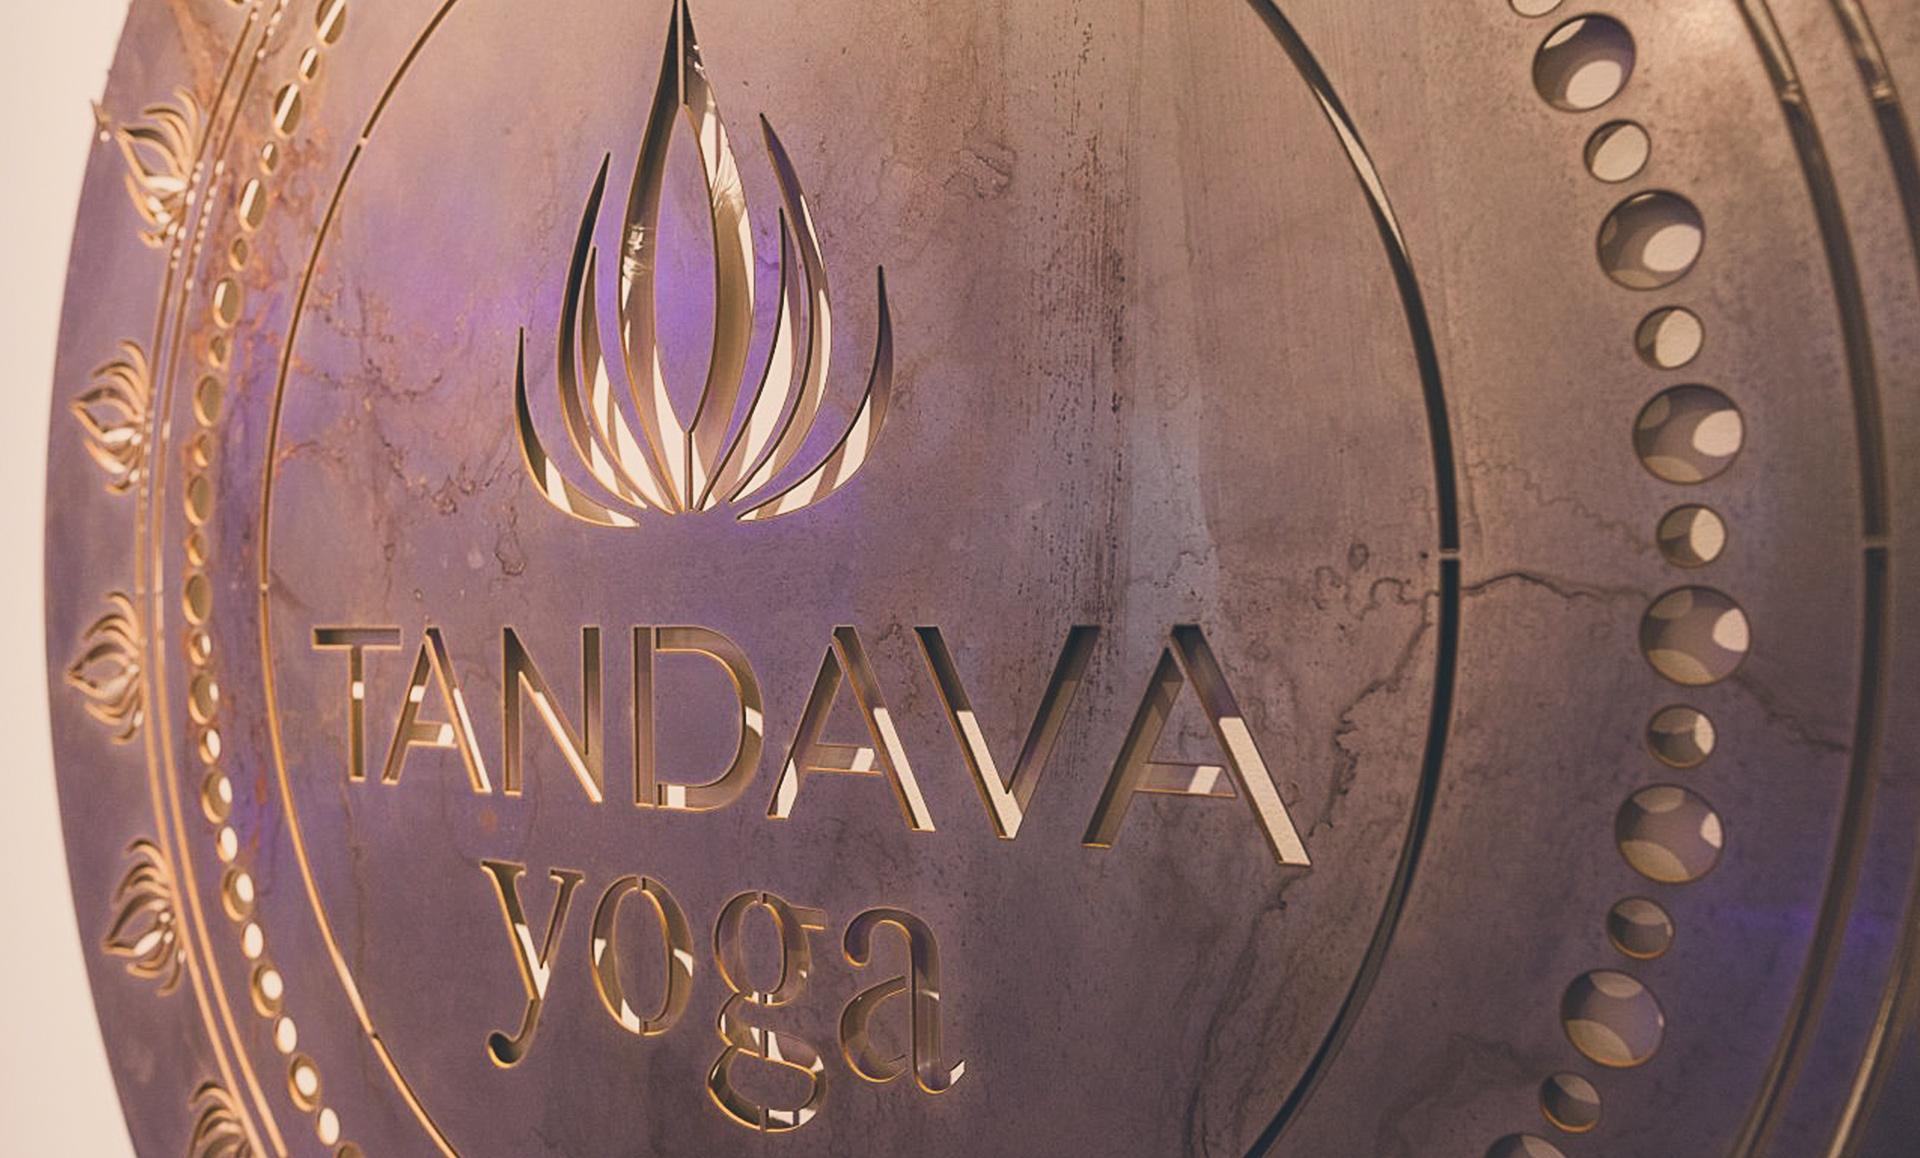 jamie langevin branding design tandava yoga logo designer vancouver copper wall art